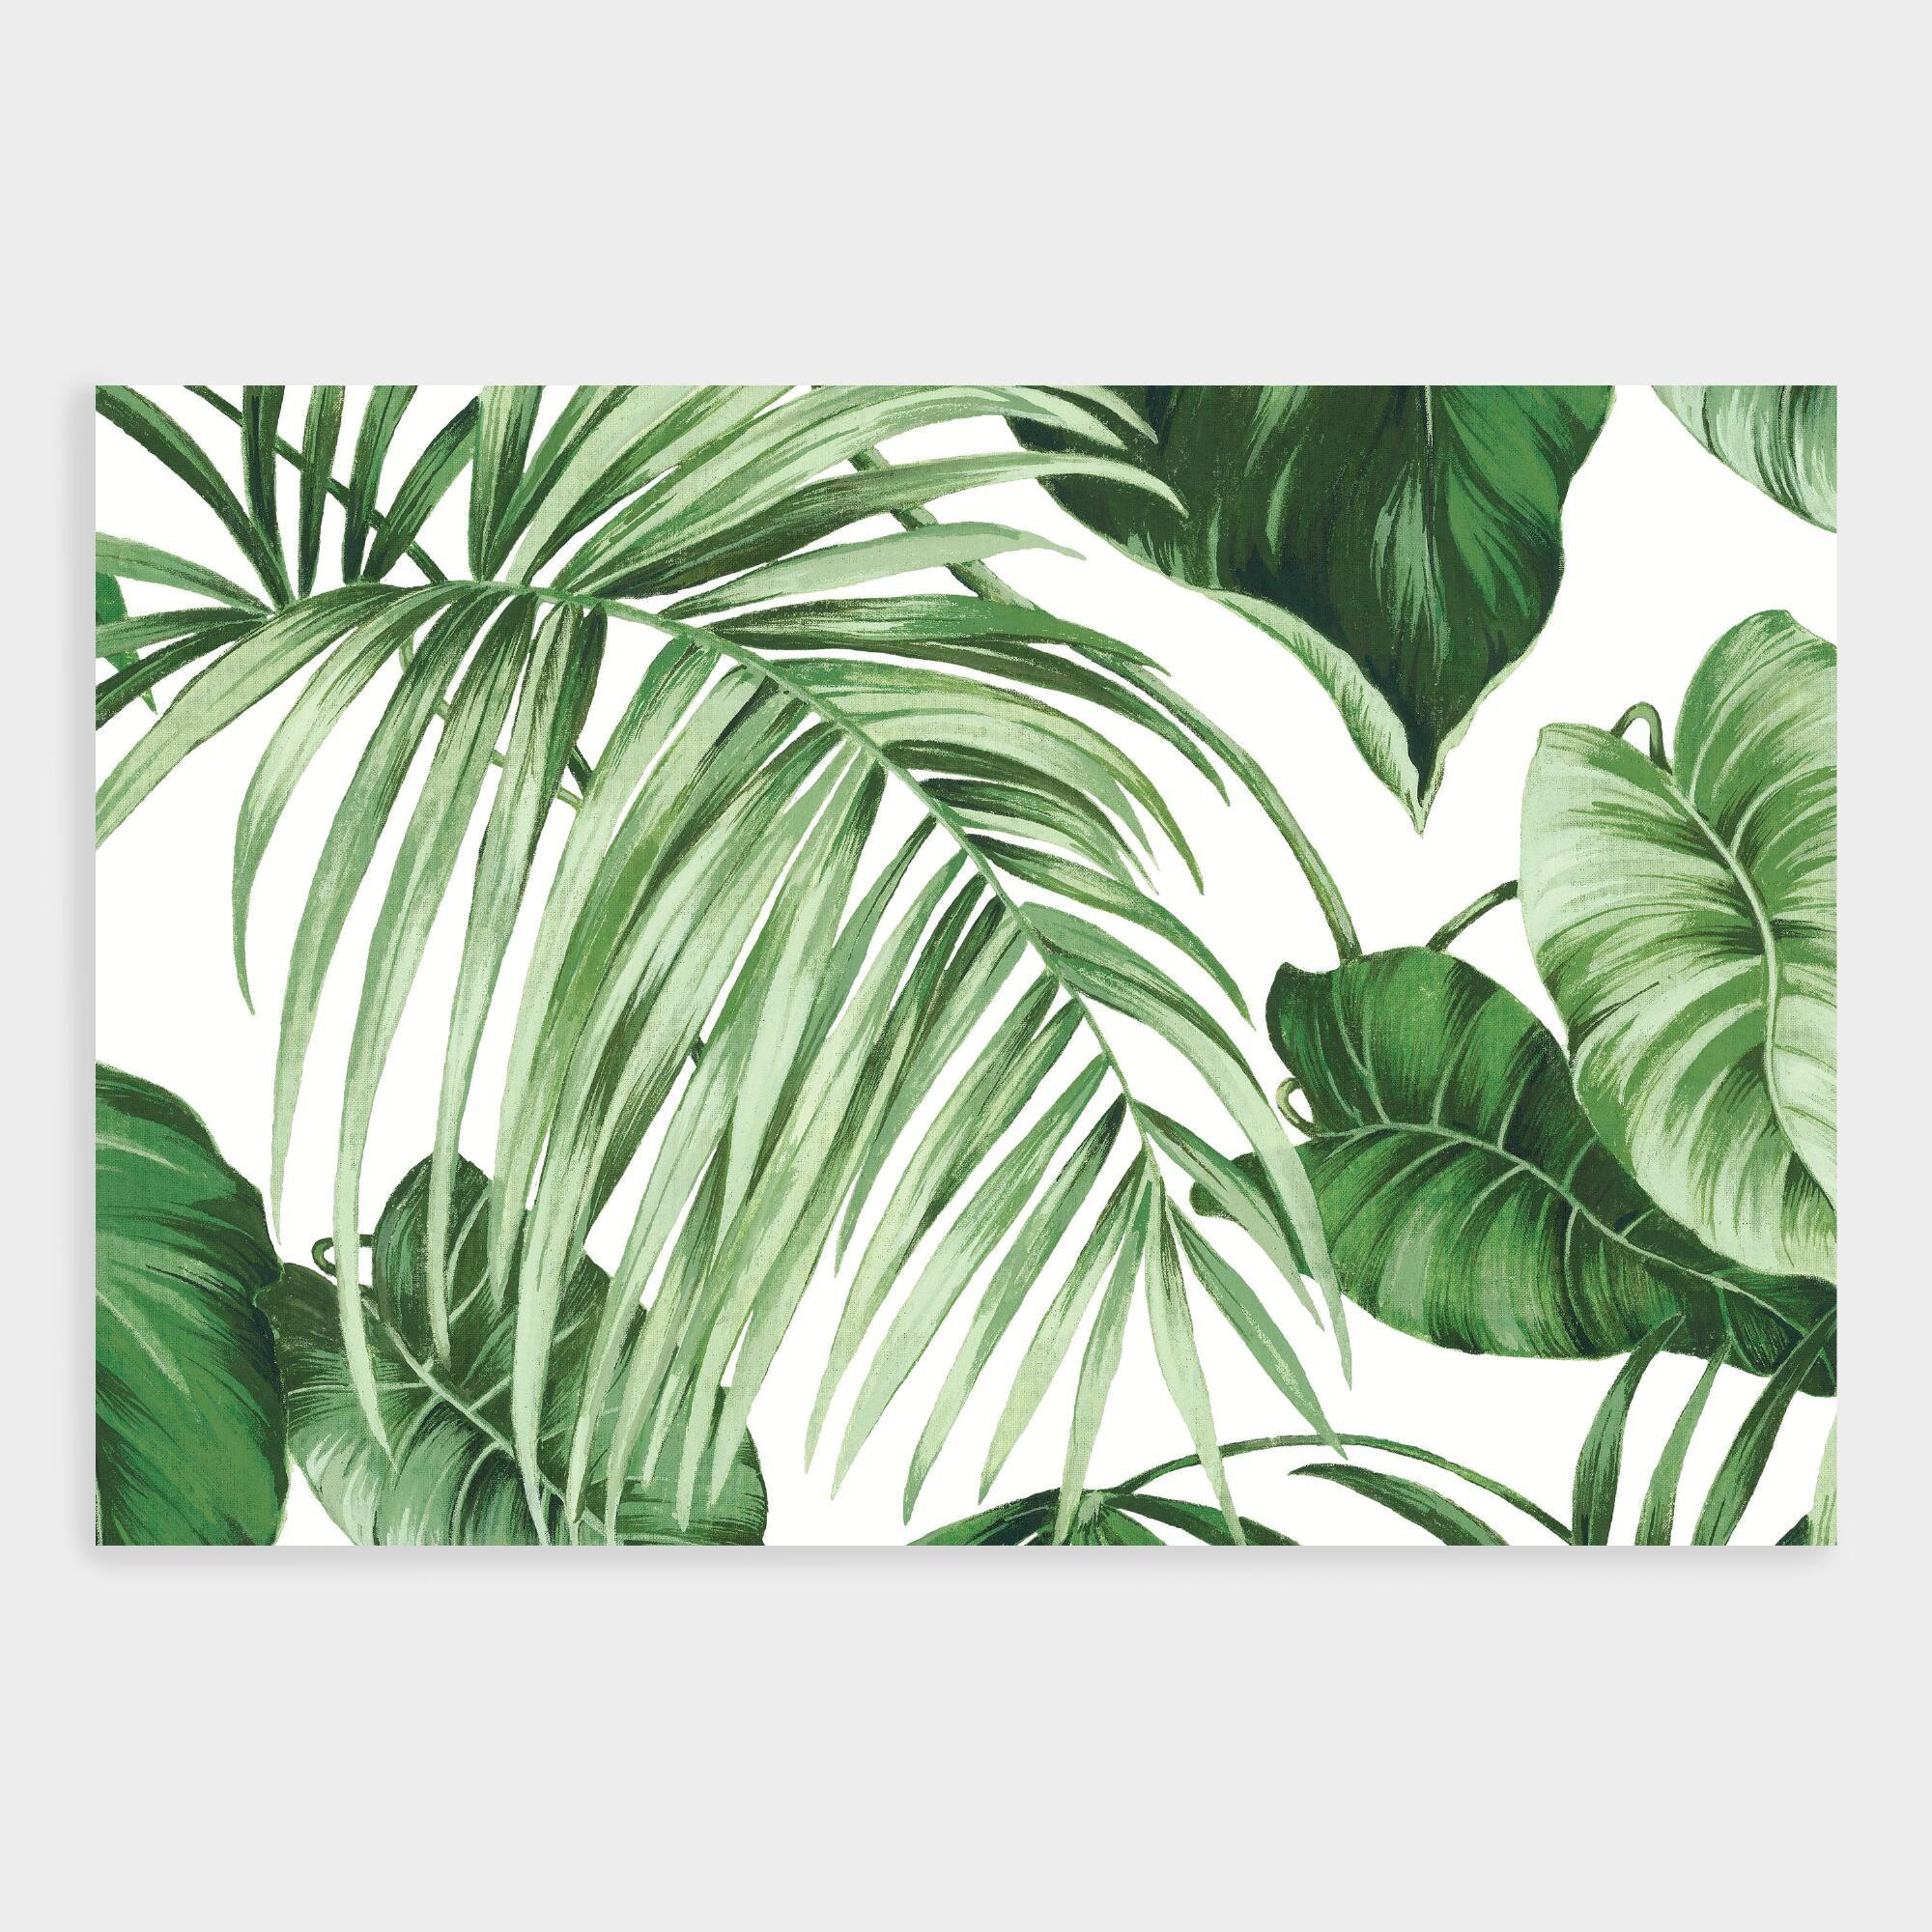 Green And White Leaves Wallpaper Mural 6ftx Leaf Wallpaper Mural Wallpaper Wallpaper